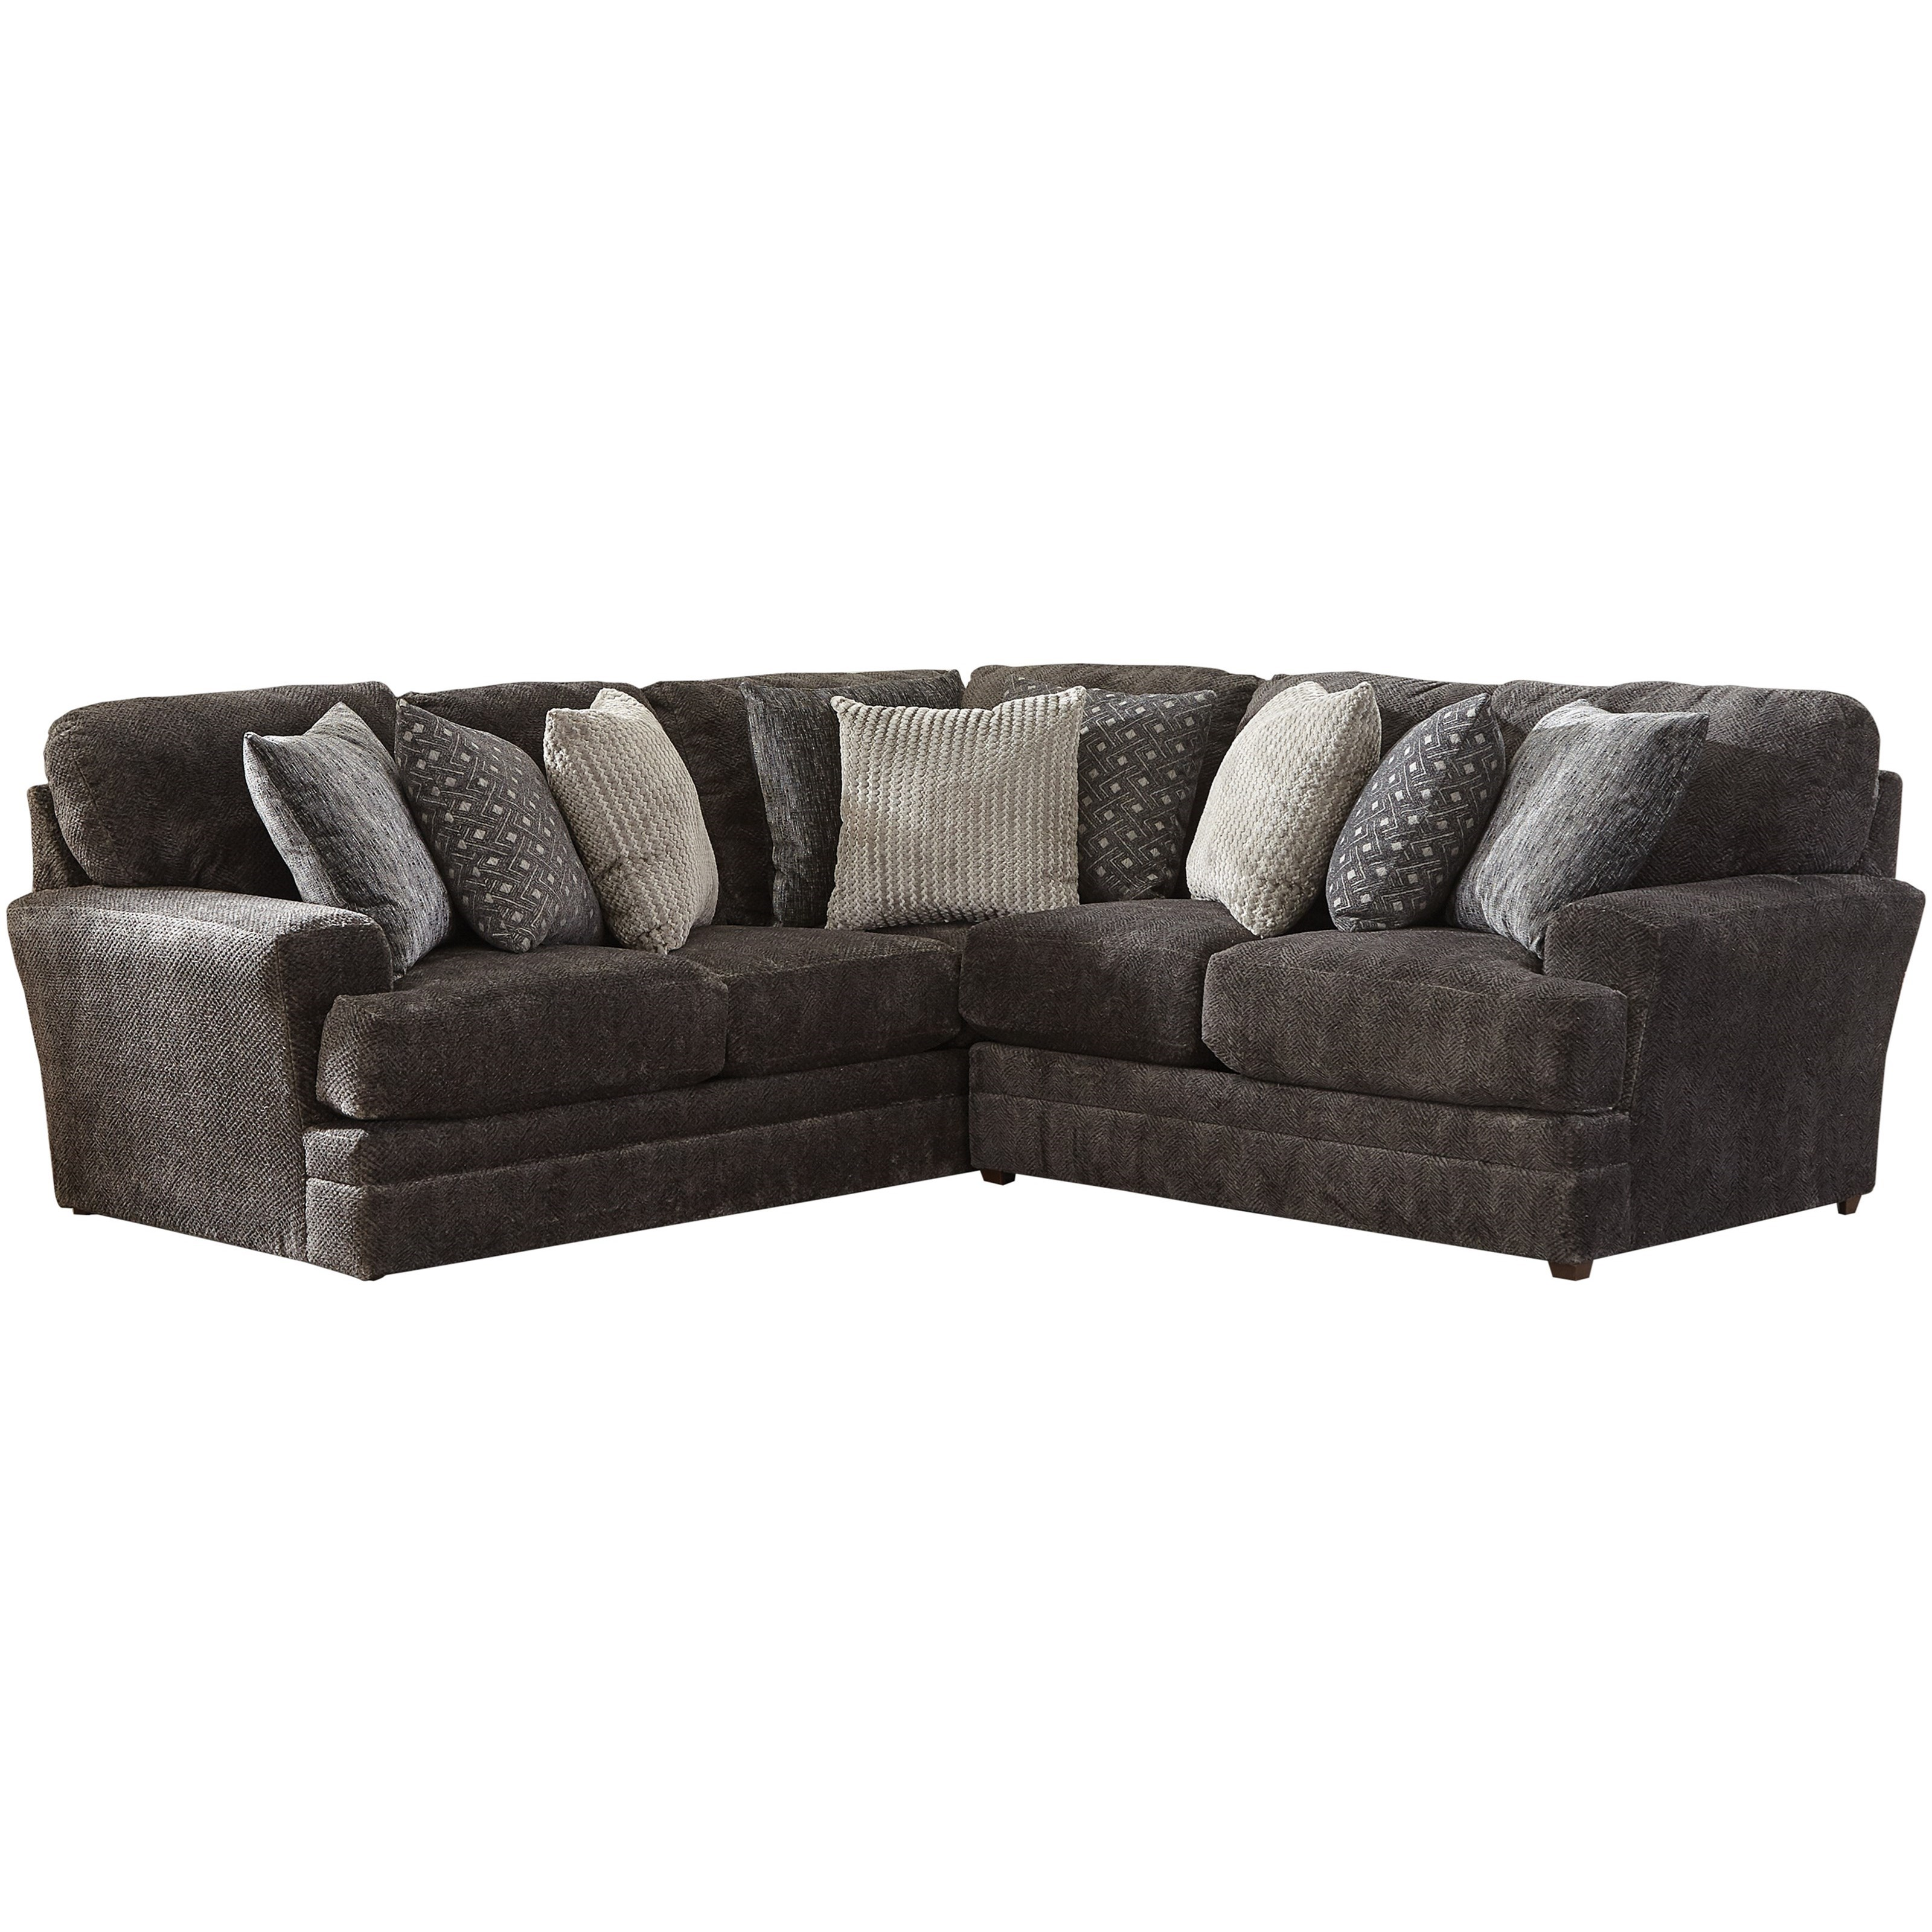 Mamba Sectional by Jackson Furniture at Crowley Furniture & Mattress